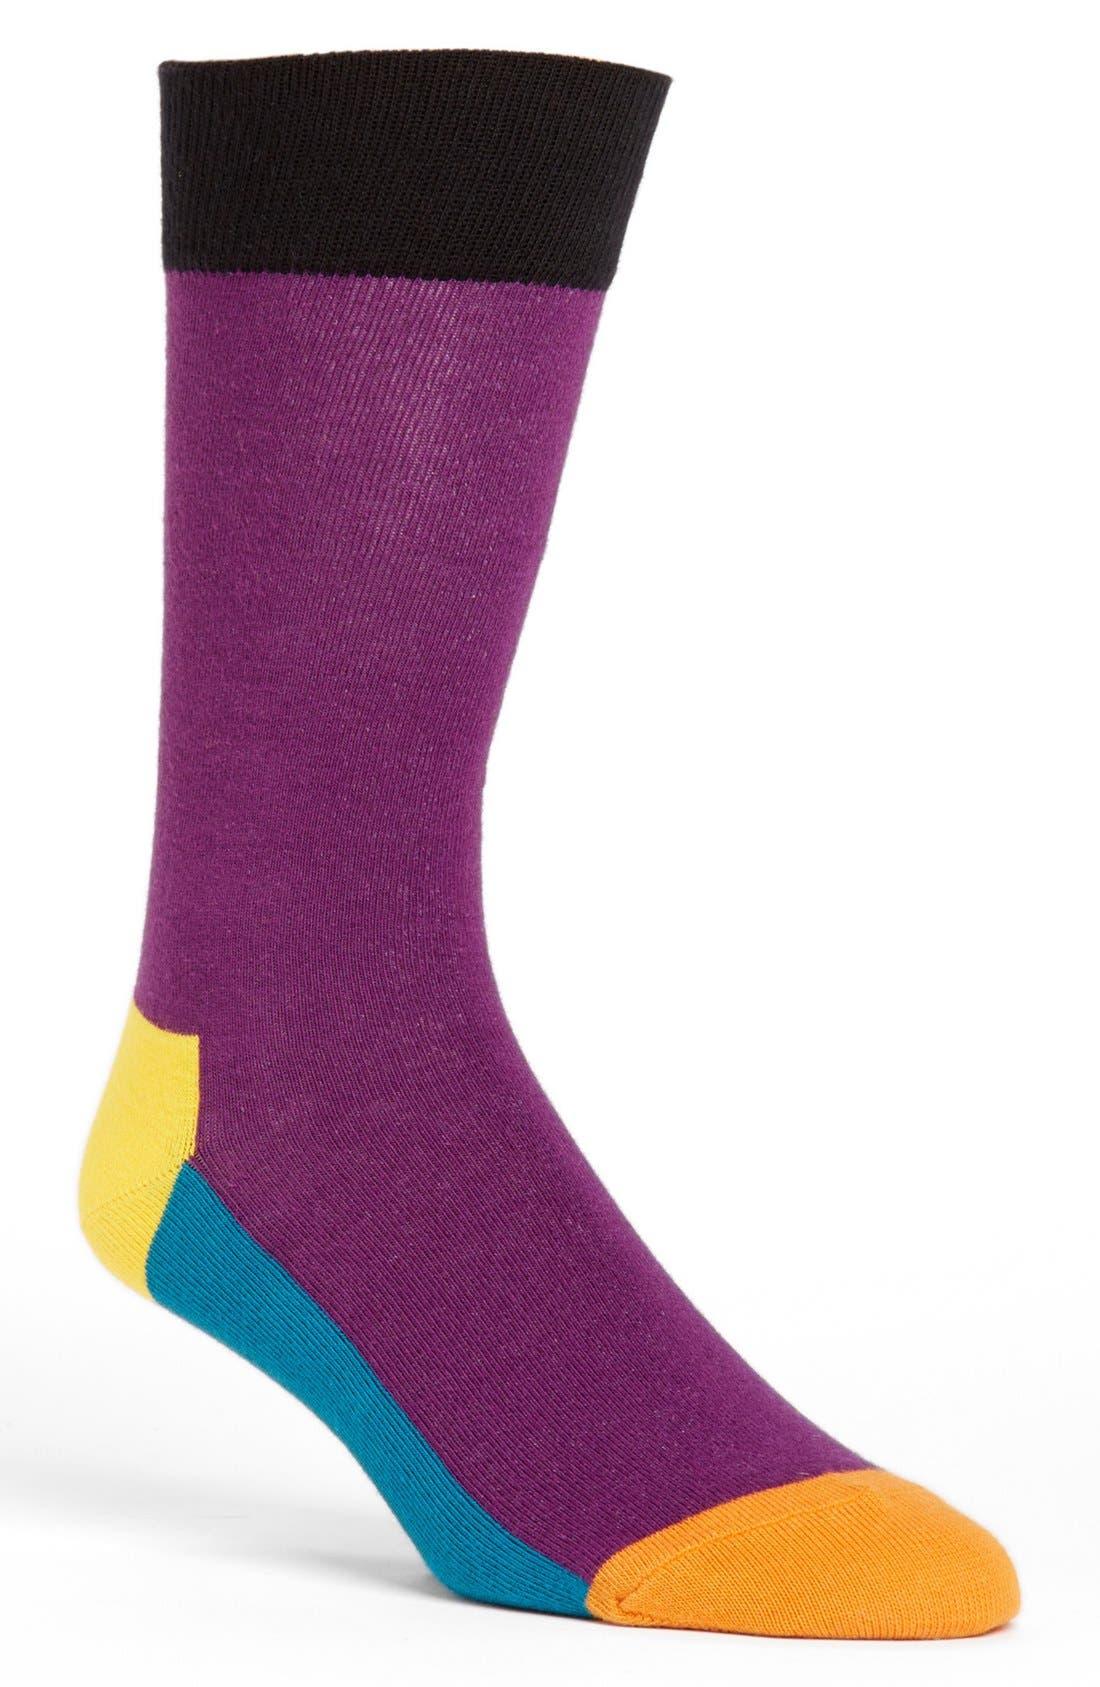 Main Image - Happy Socks 'Five Color' Socks